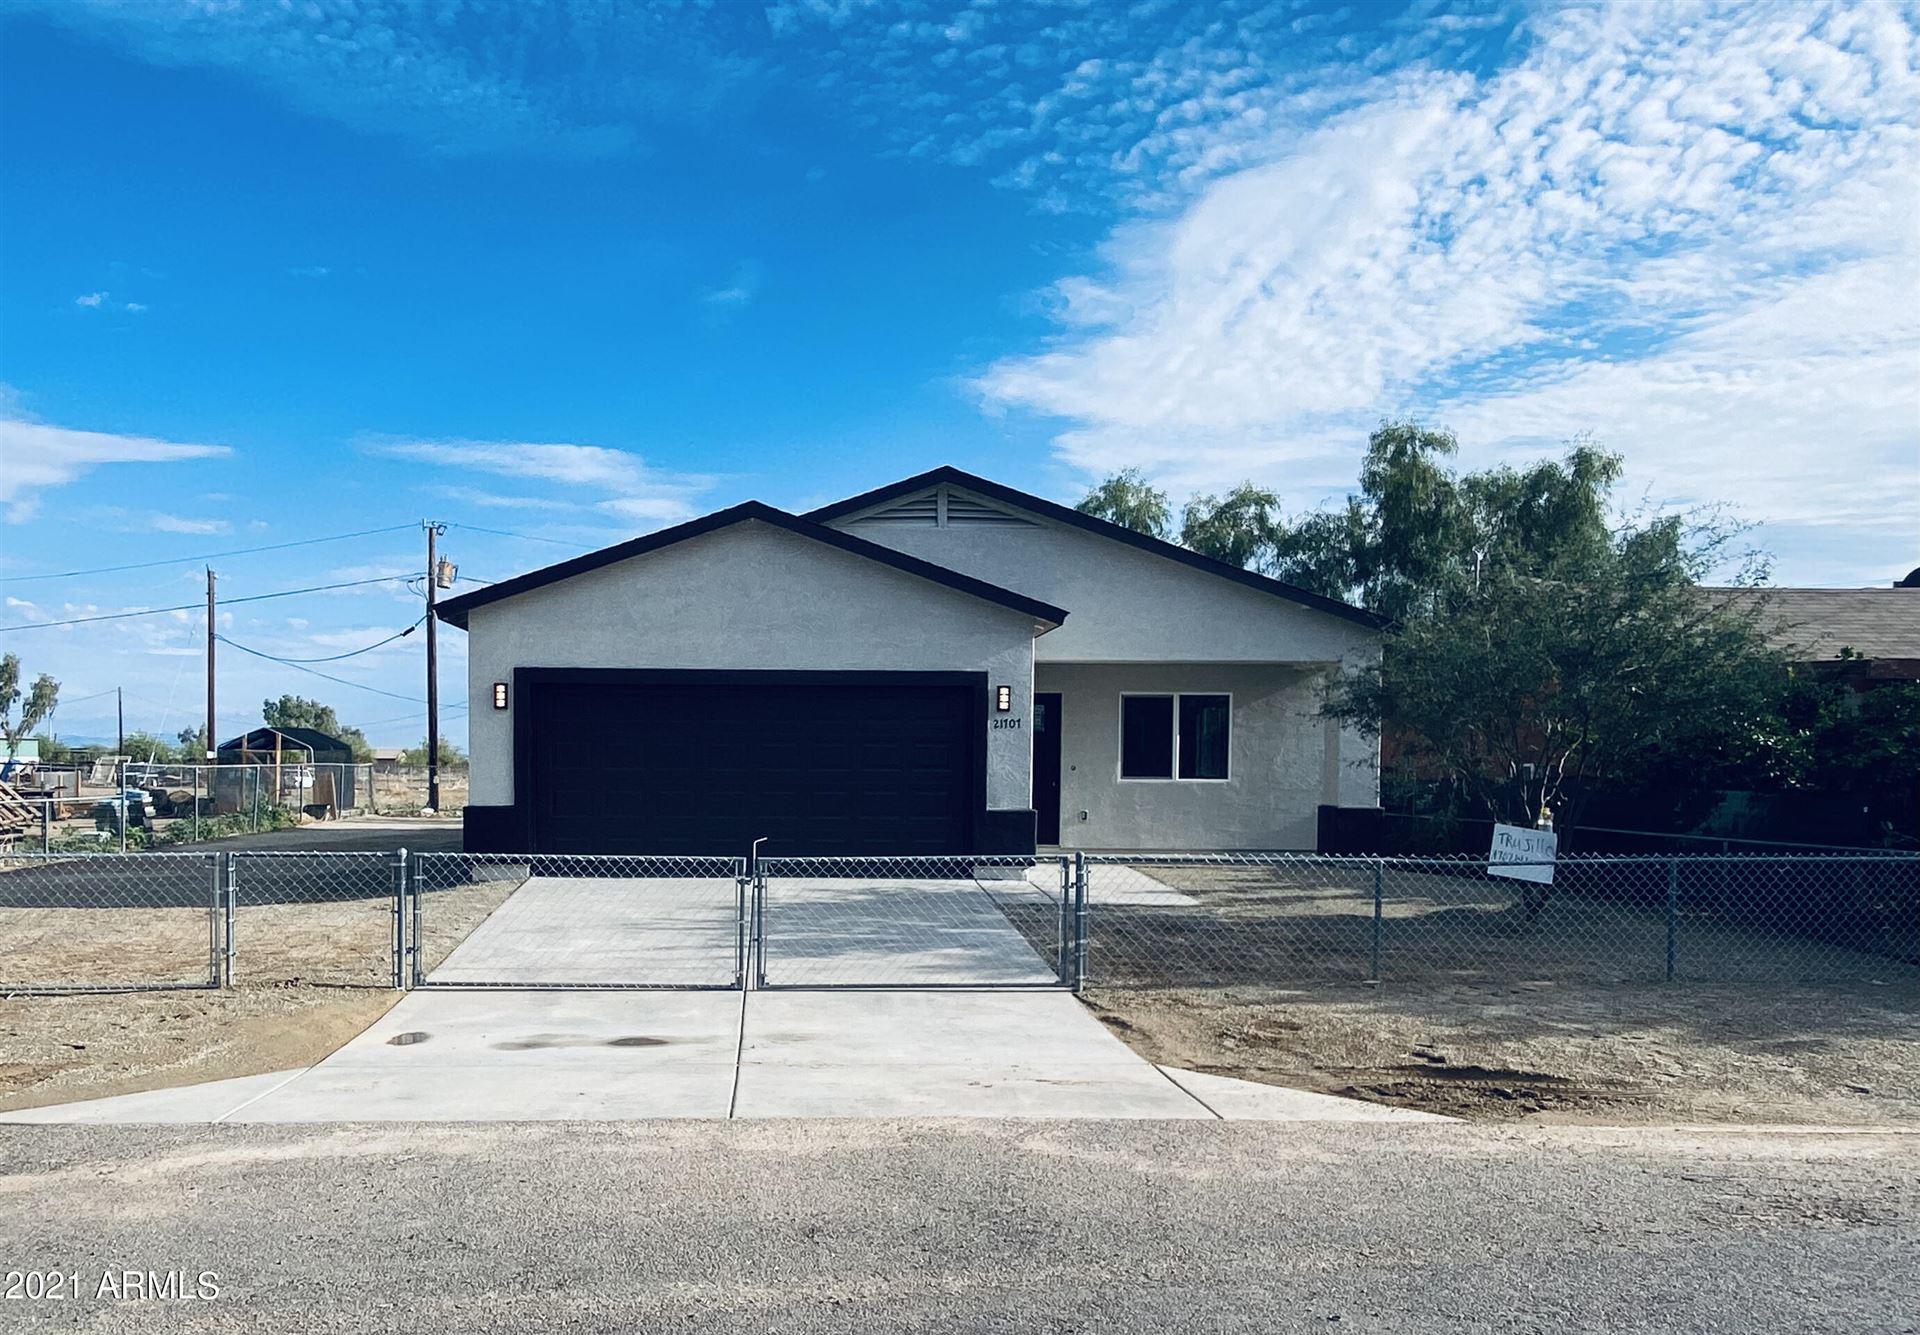 21707 W LAURA Street, Wittmann, AZ 85361 - MLS#: 6269443